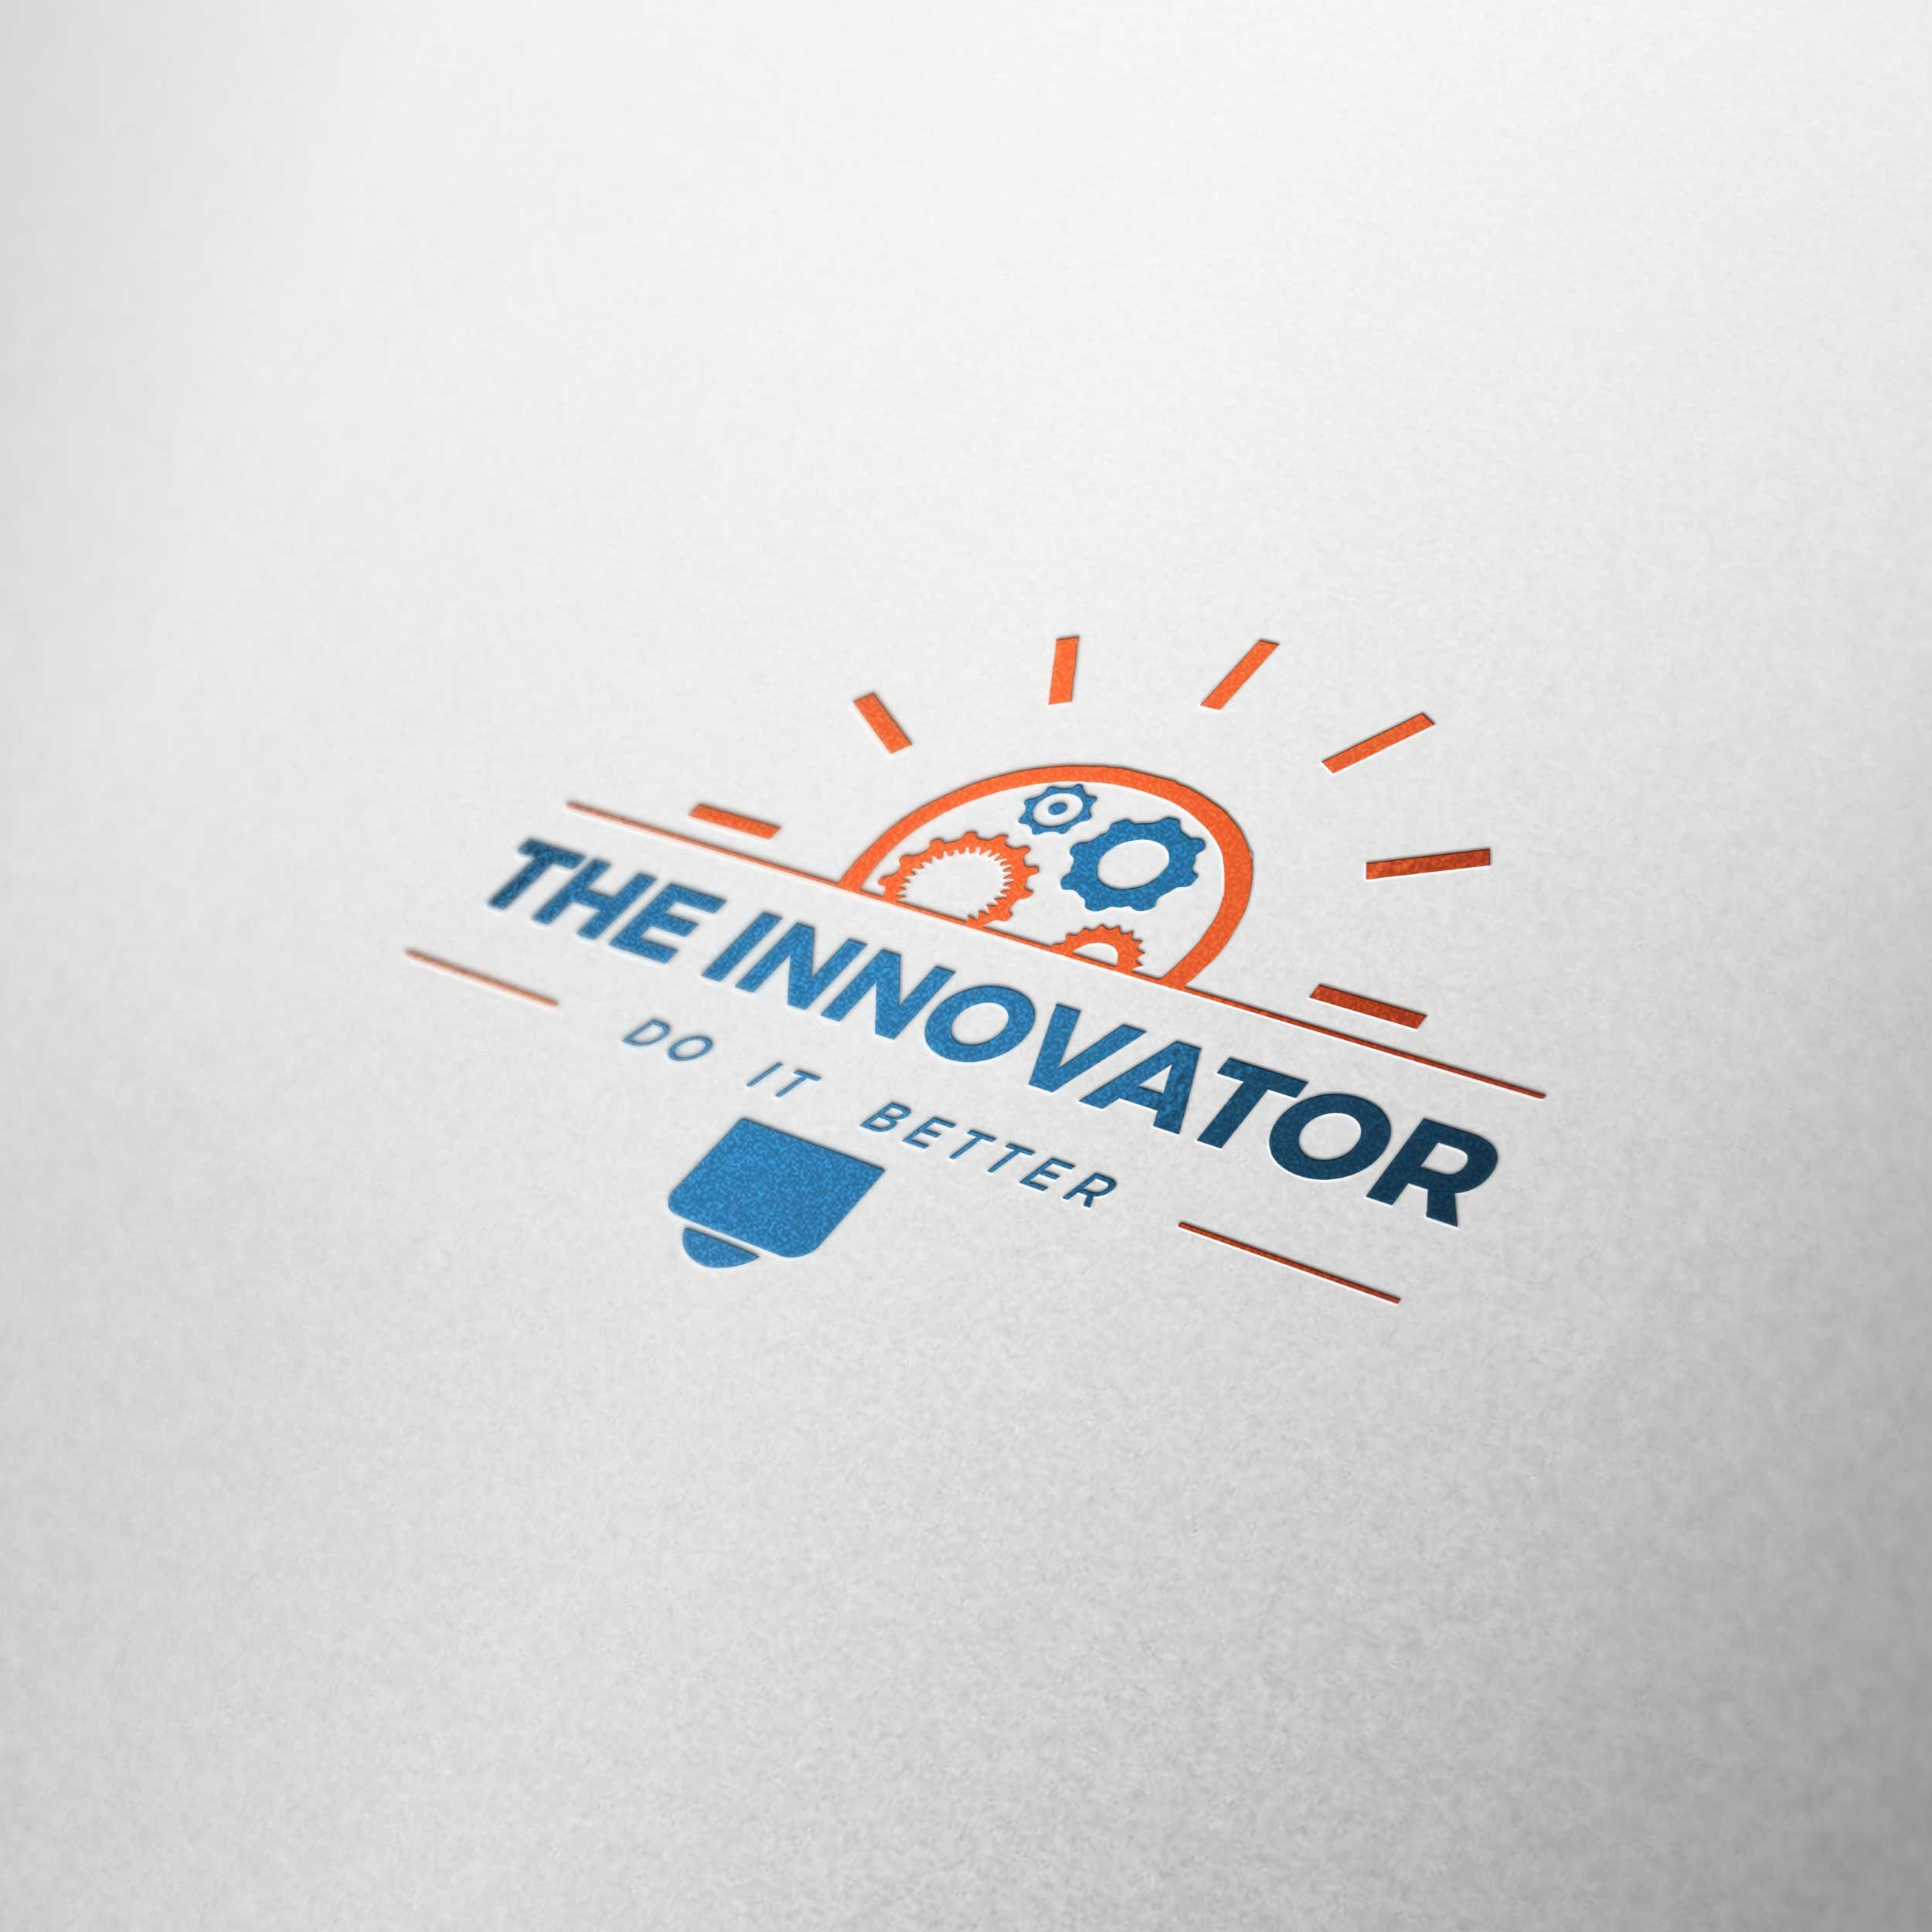 THE-INNOVATOR-min